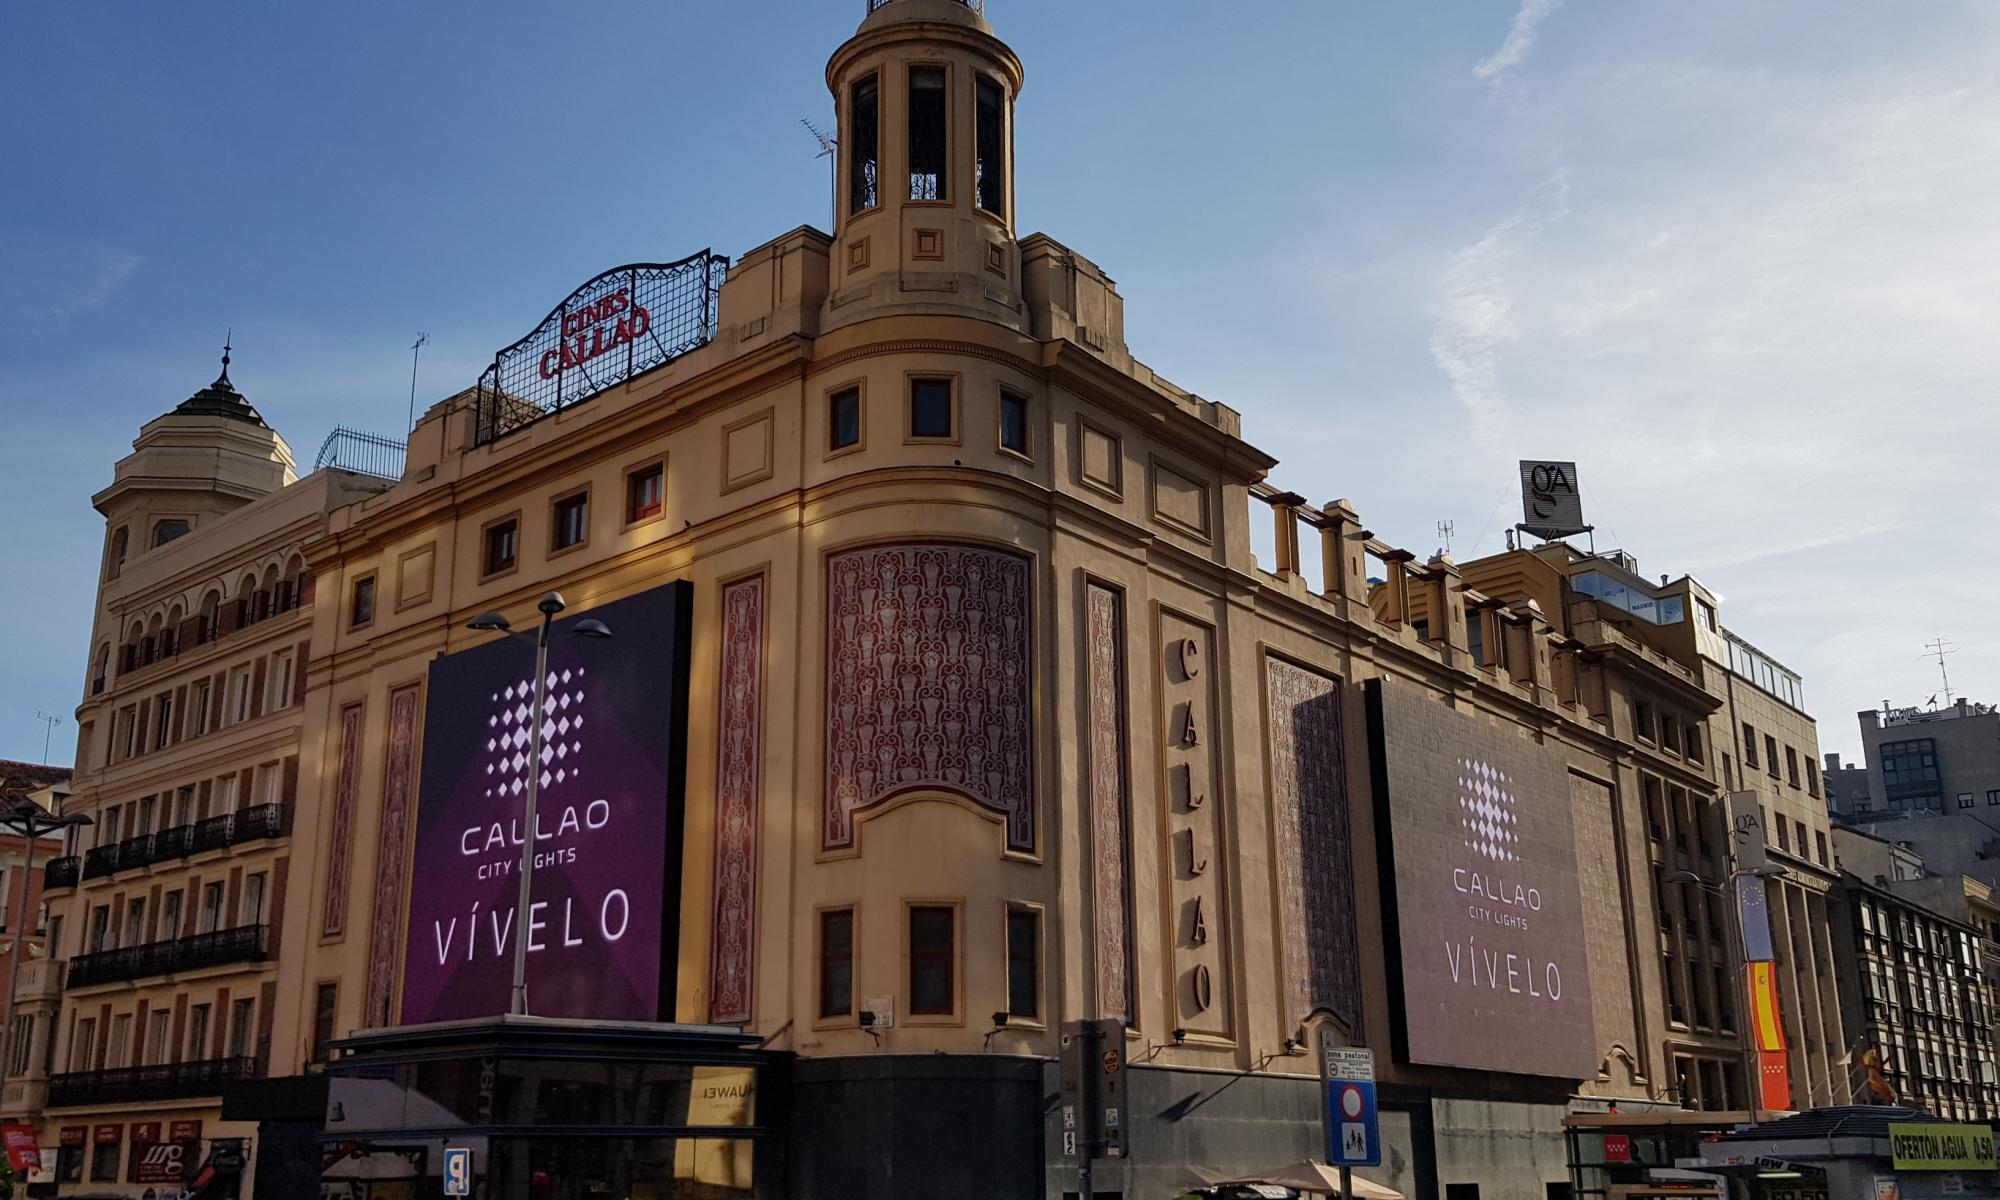 Callo City Lights pantallas